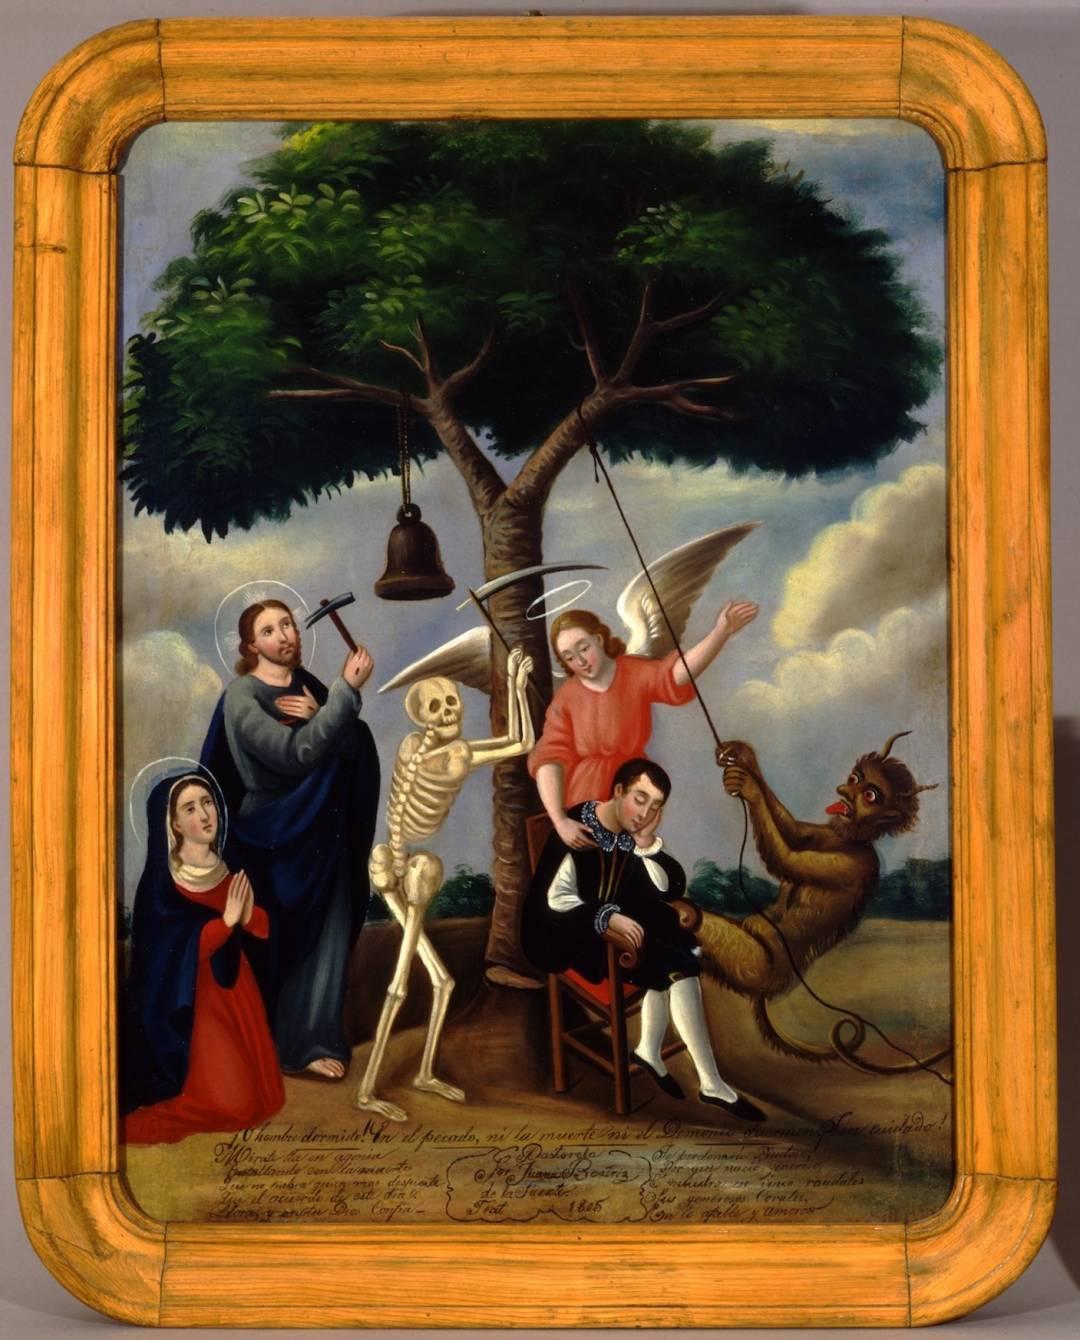 Картина «Древо життя» Хуани Беатріс де ла Фуенте